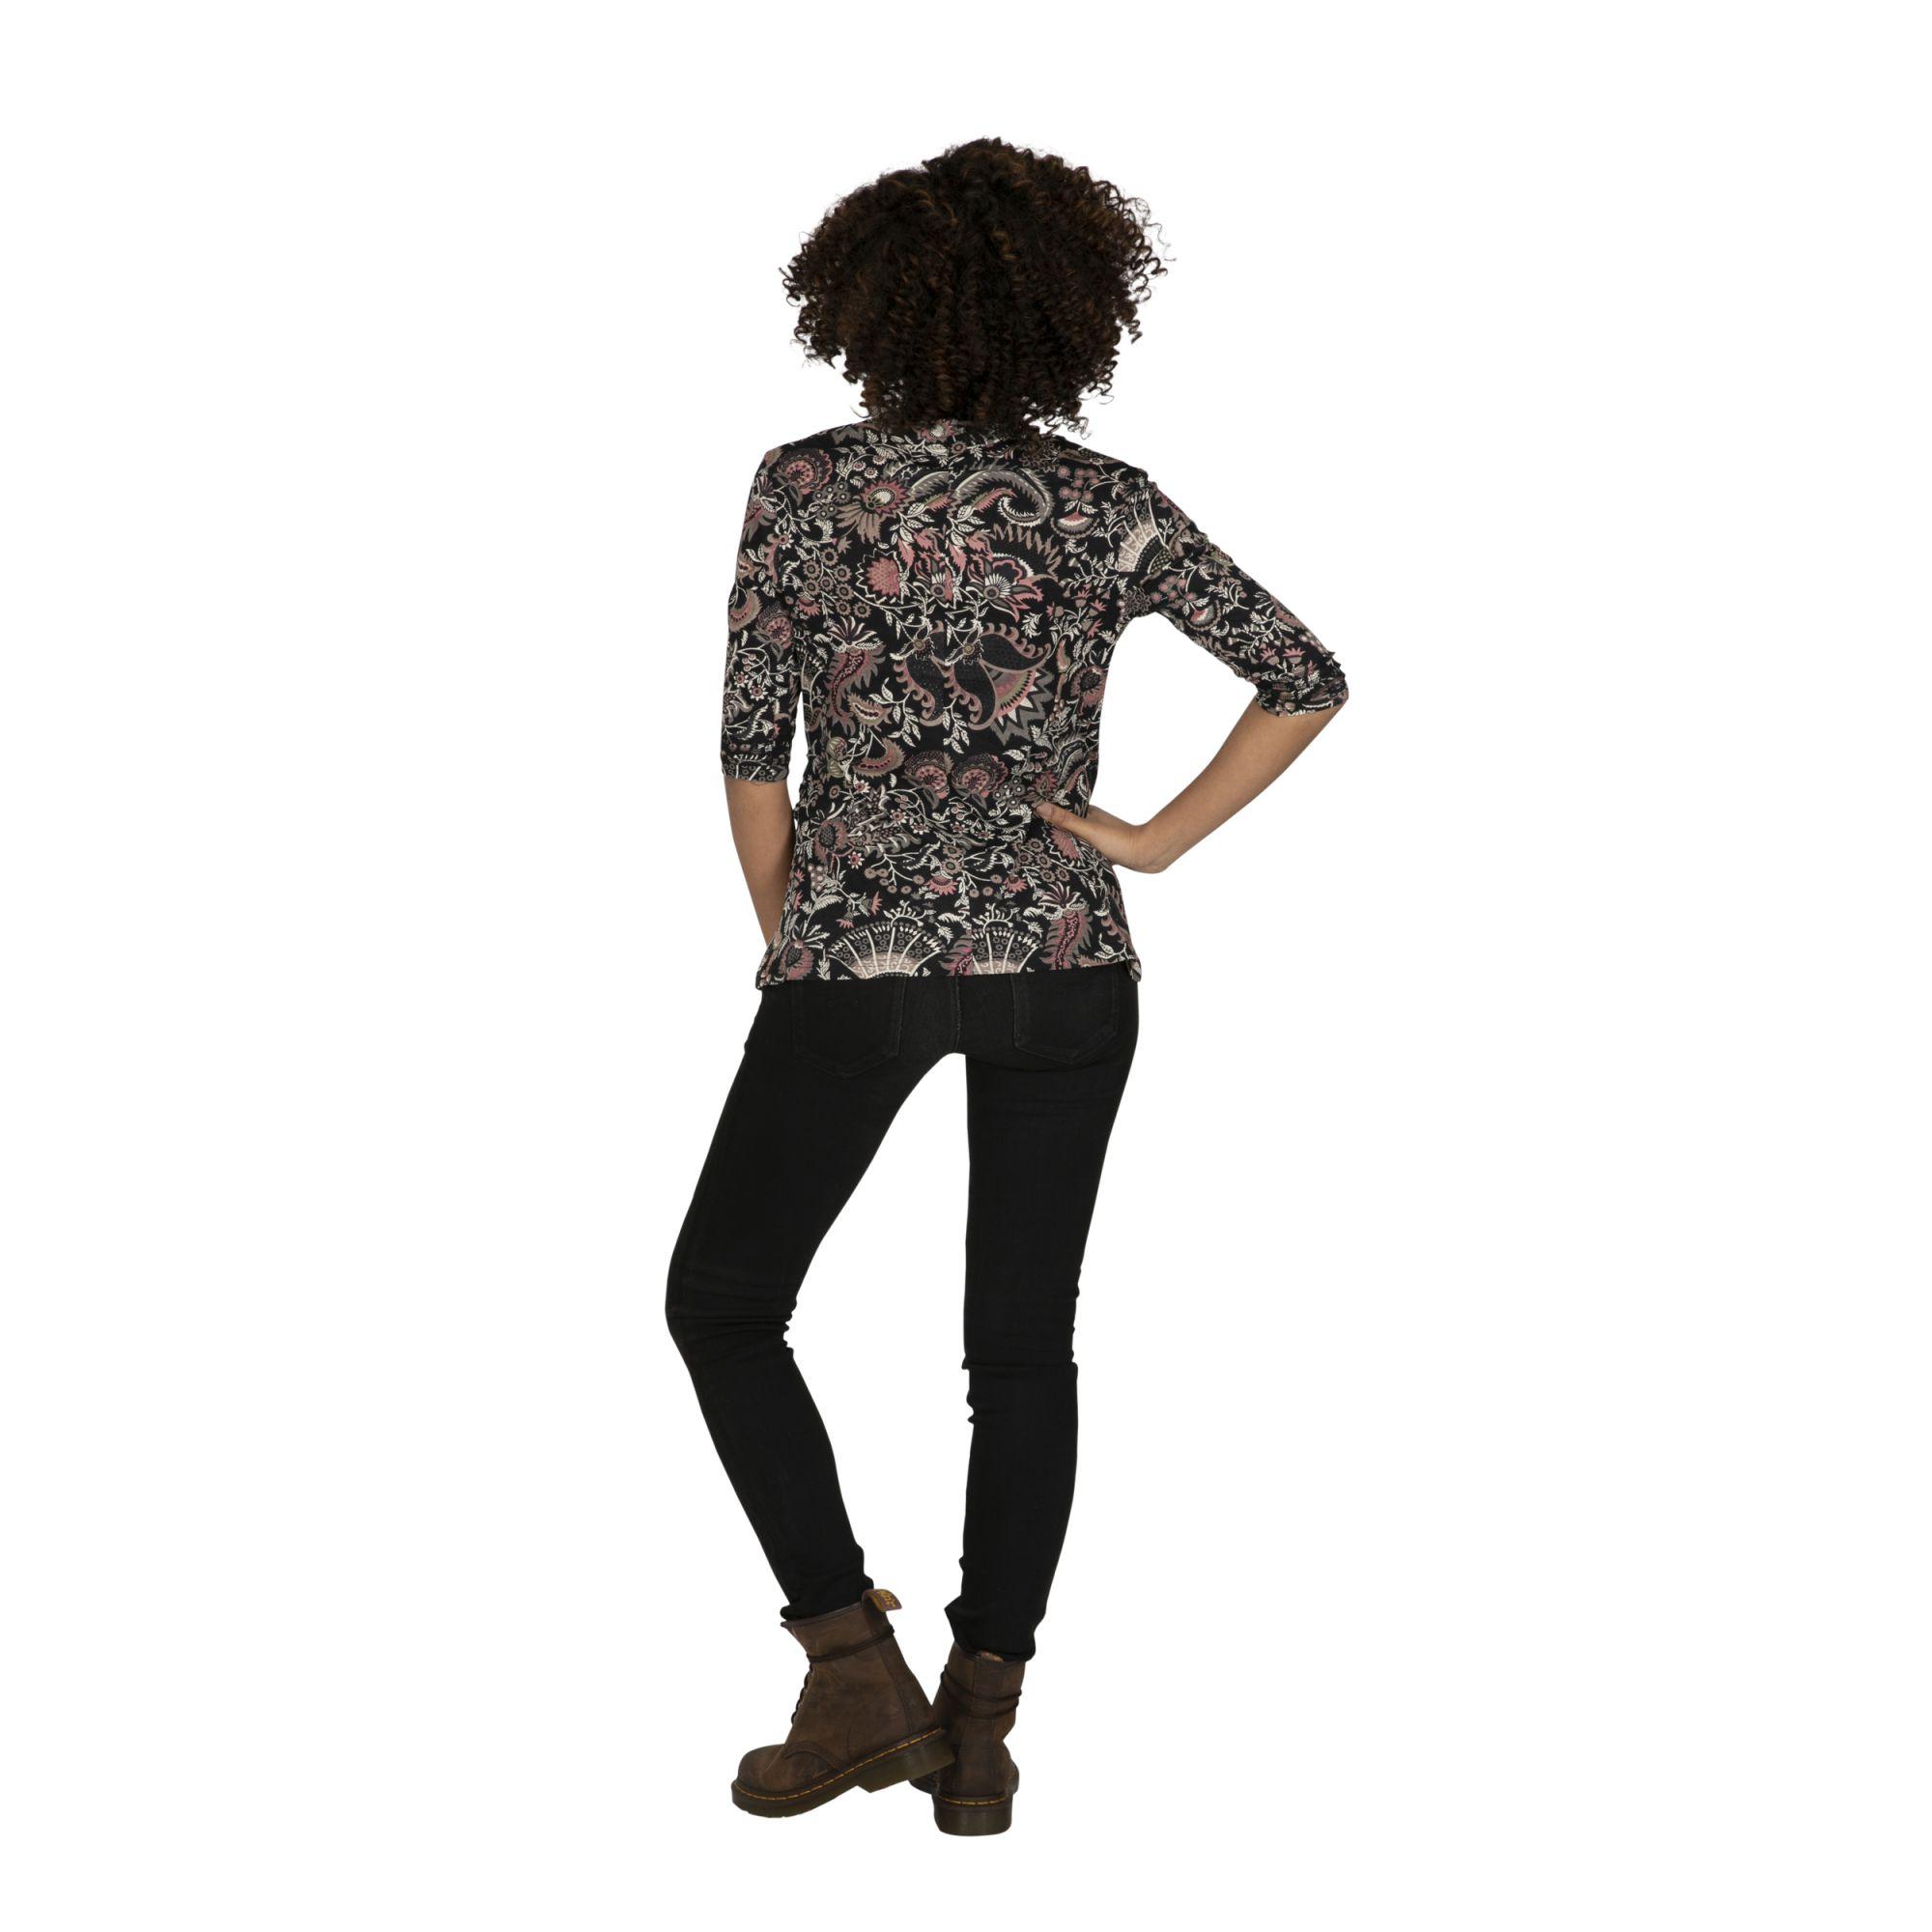 Tee-shirt femme bohème aux manches 3/4 Mukono